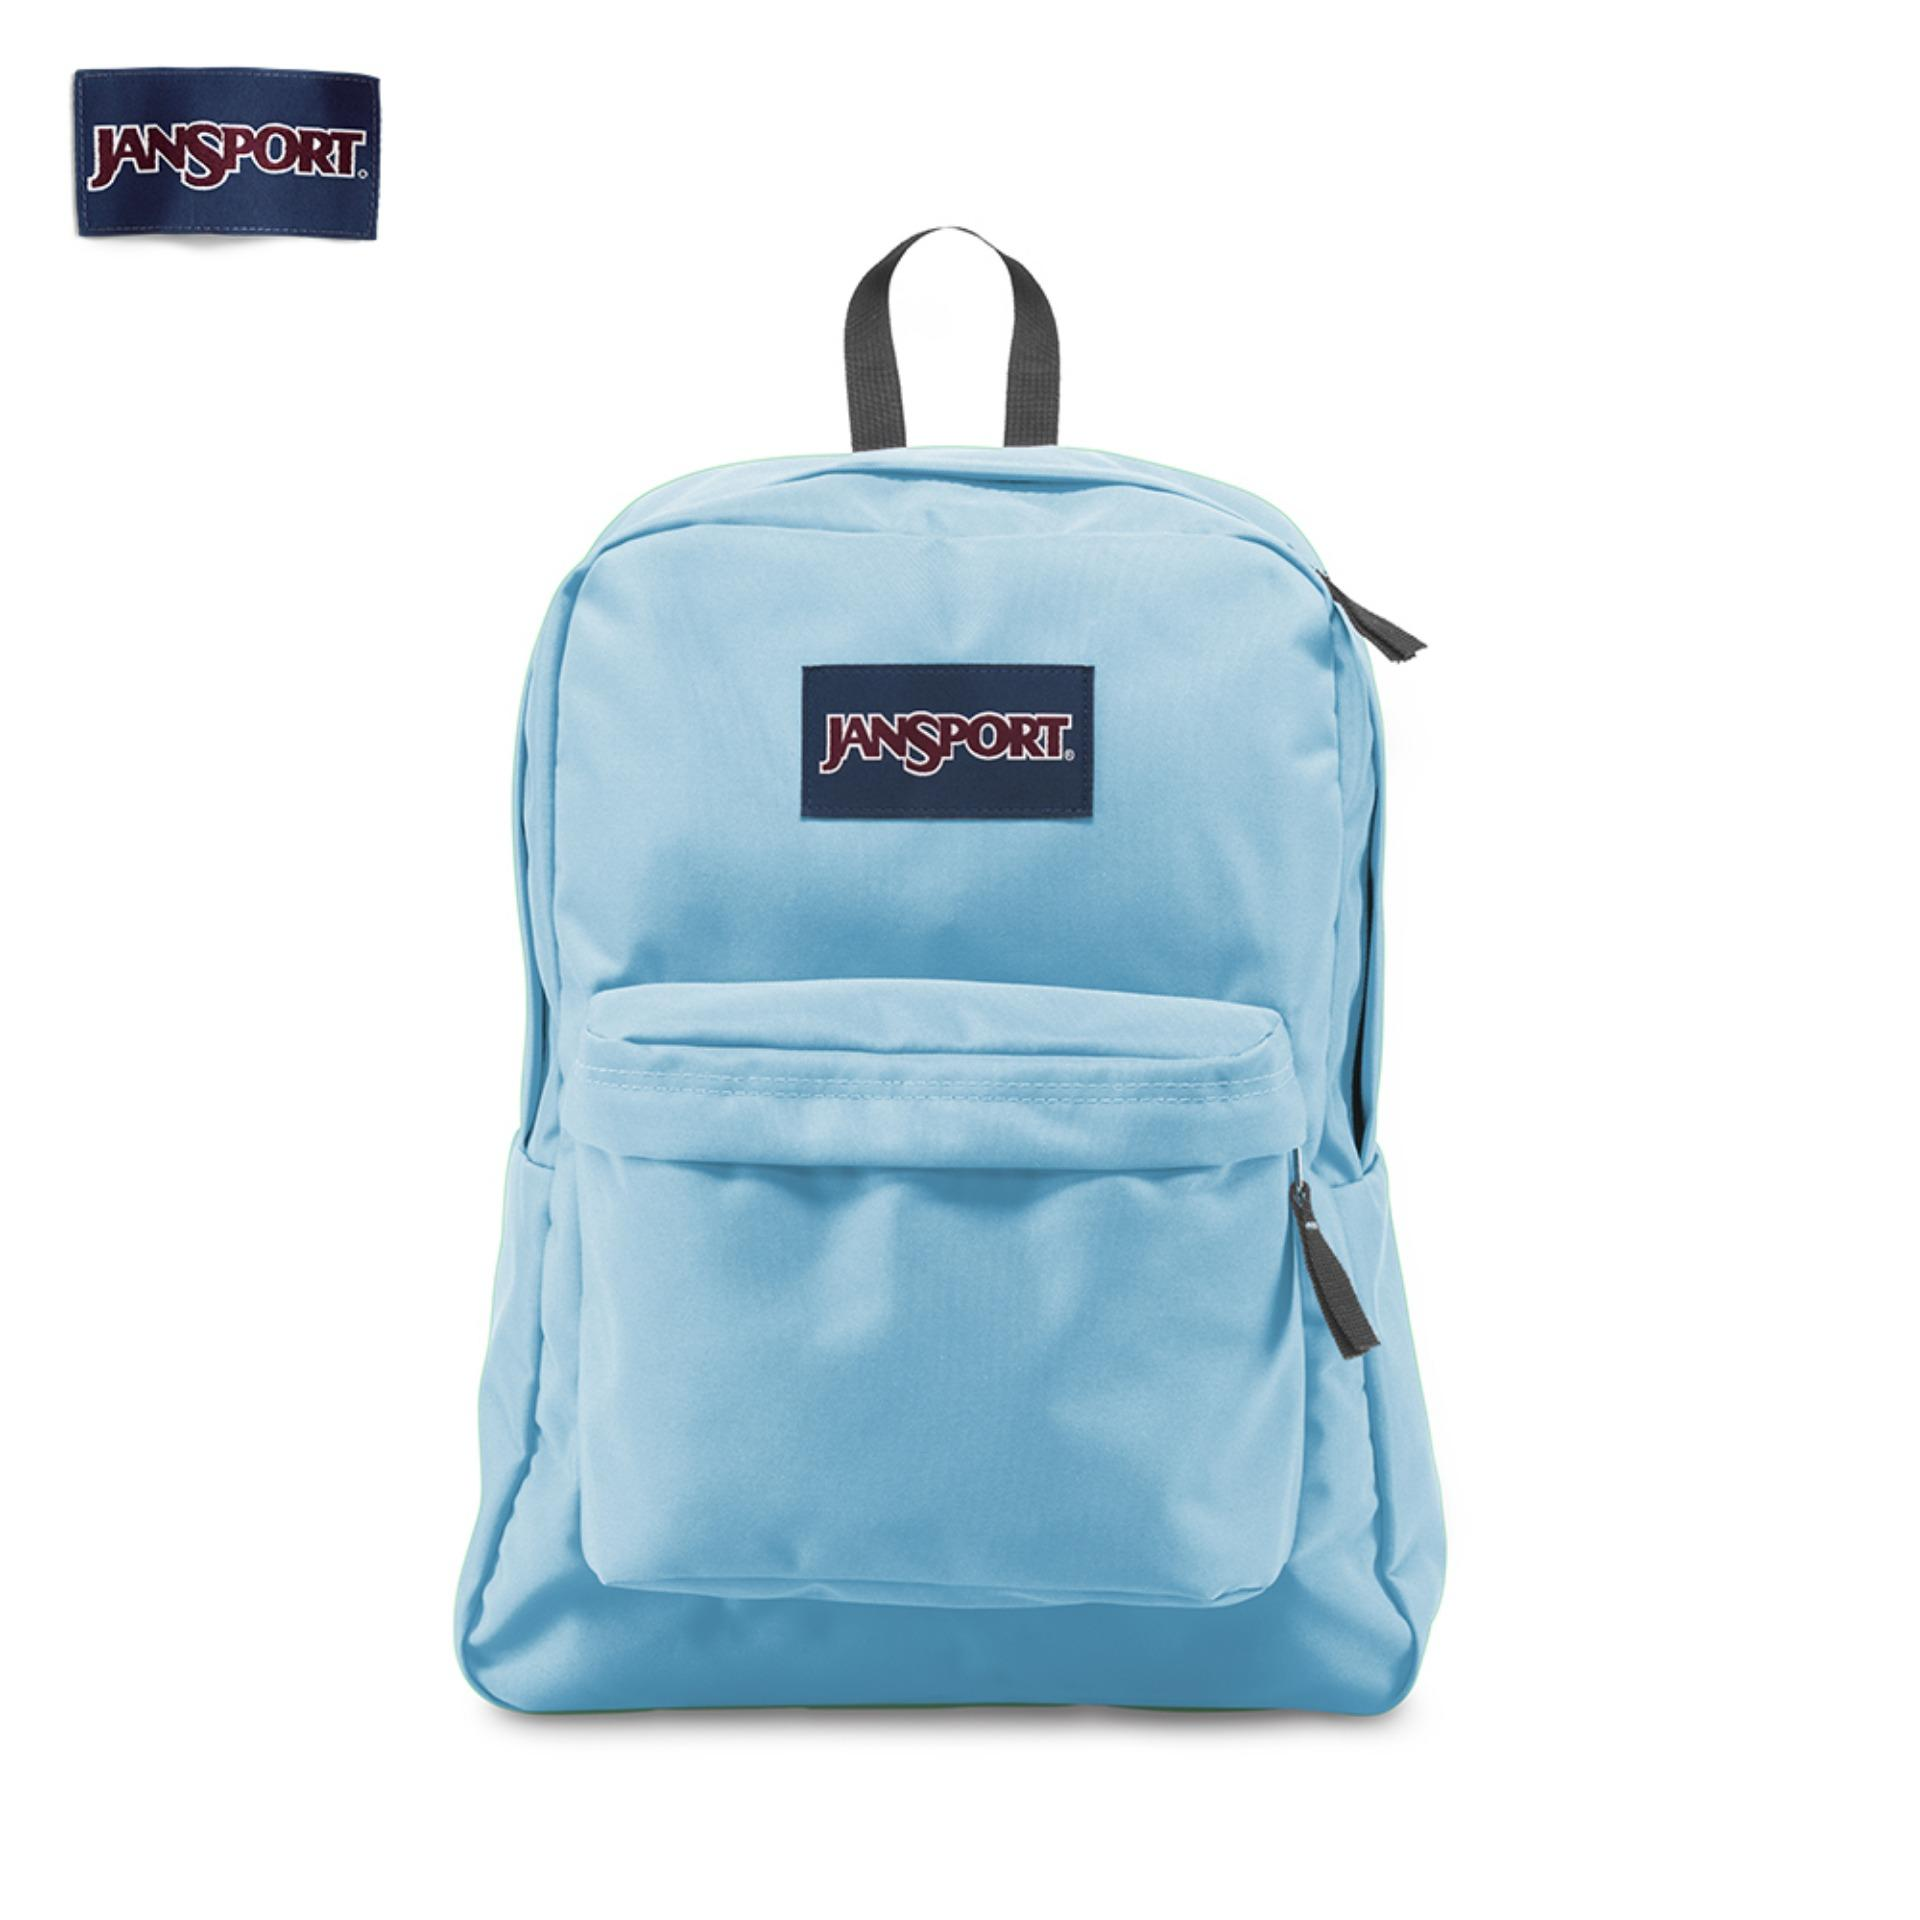 JanSport Philippines: JanSport price list - JanSport Bags